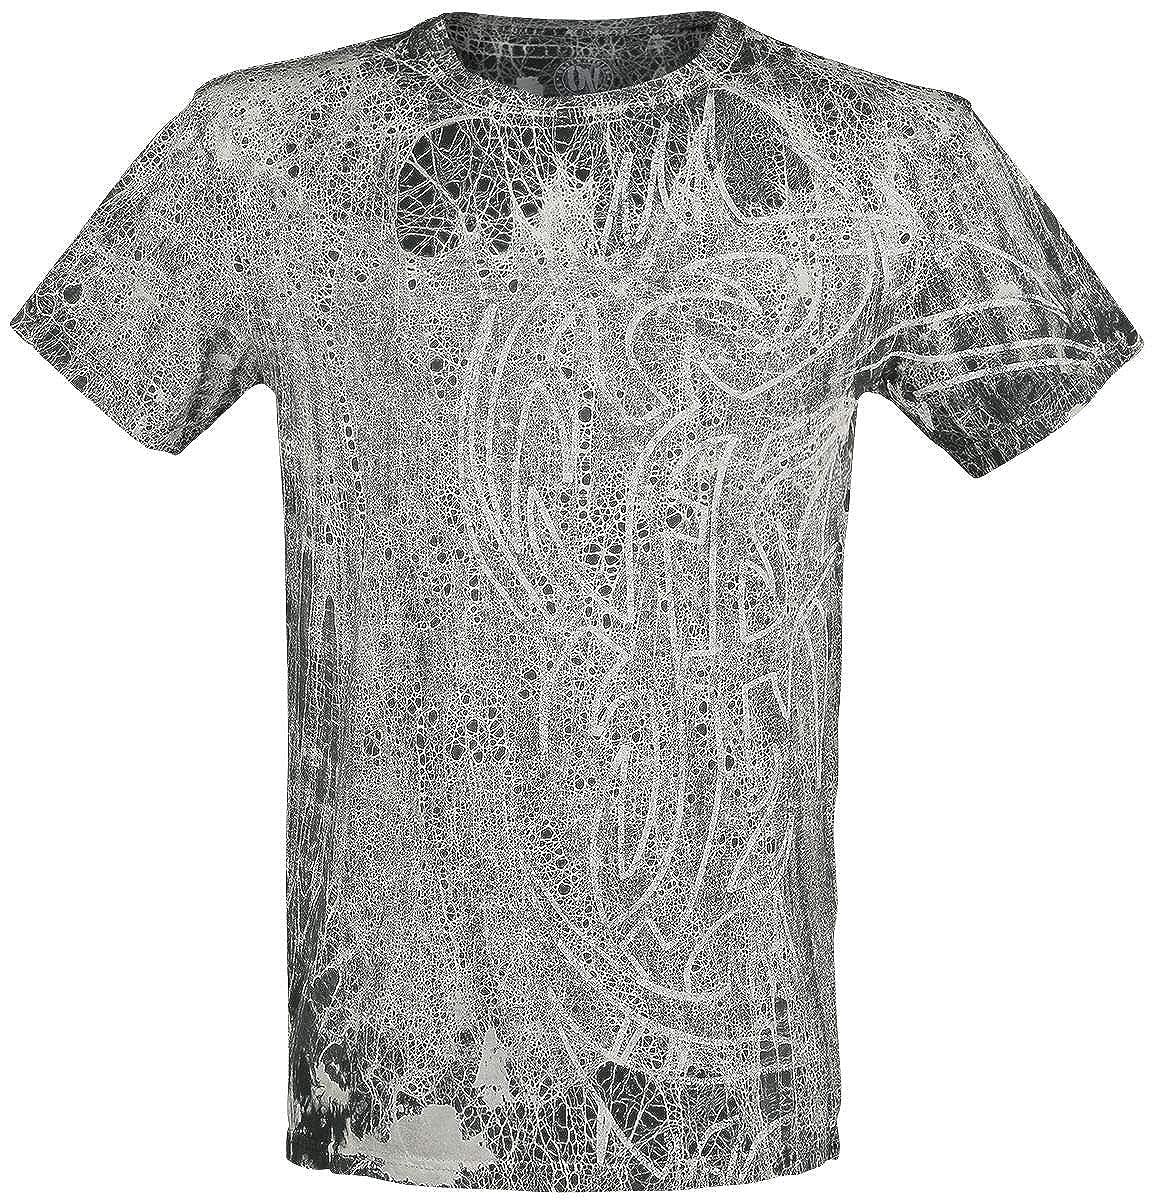 Outer Vision Ninja Tattoo Camiseta Negro XL: Amazon.es: Ropa ...